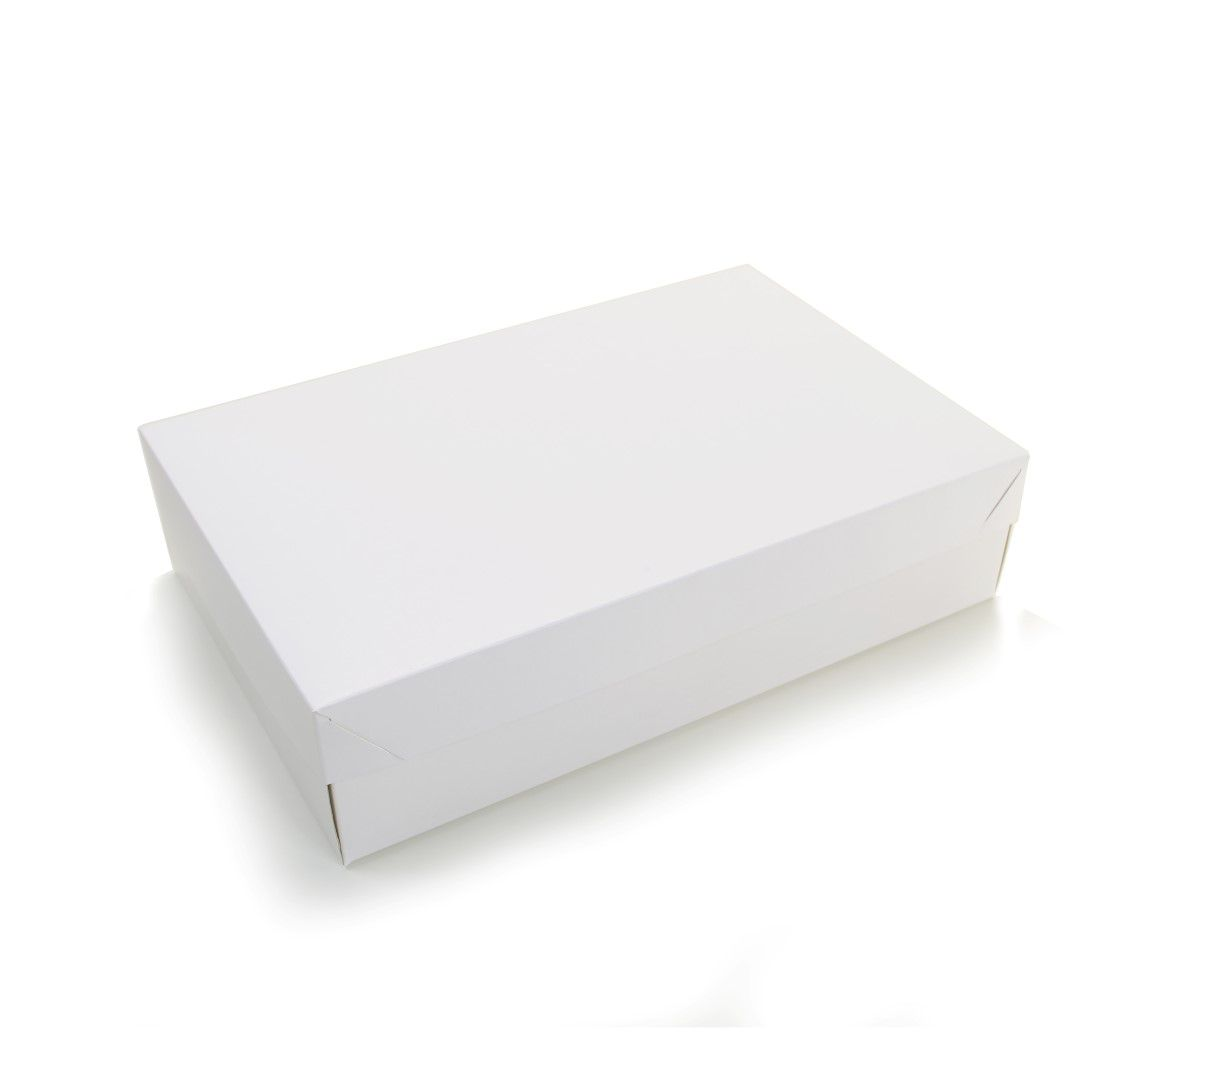 Ref 106 Branca - Caixa c/ tampa papel - 37x24x9 cm - c/ 10 unidades